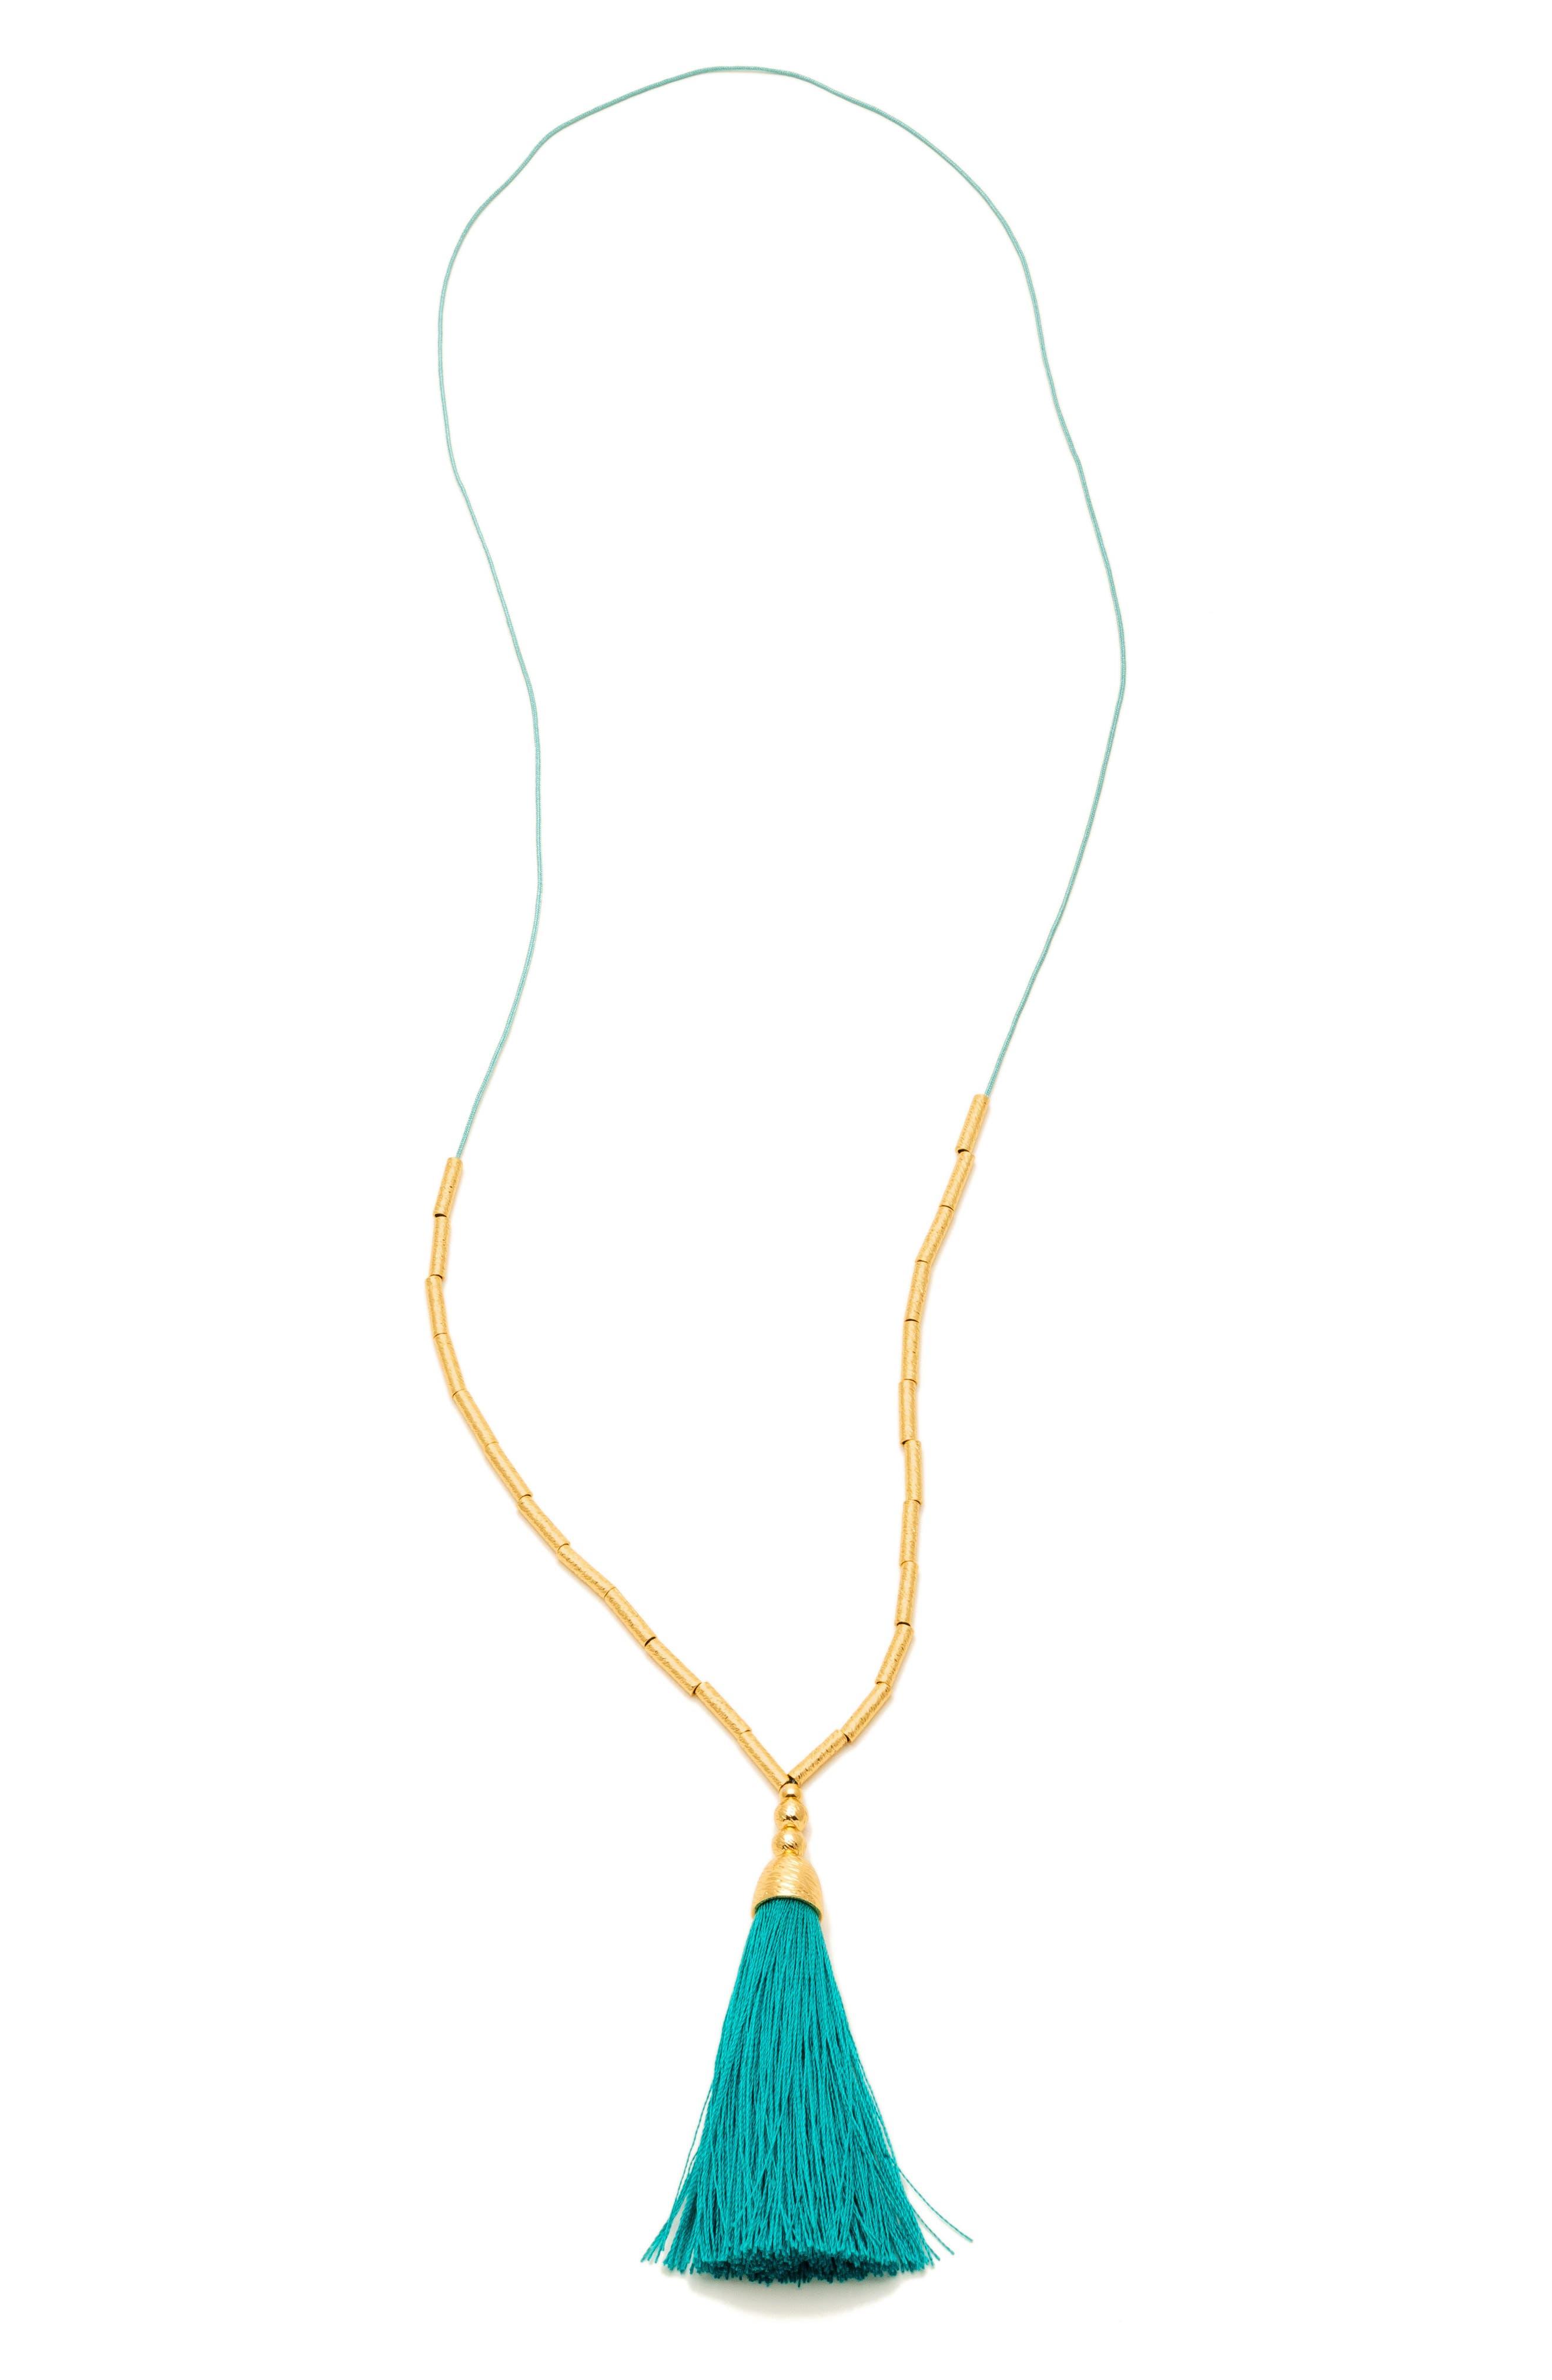 Main Image - gorjana Tulum Long Tassel Pendant Necklace